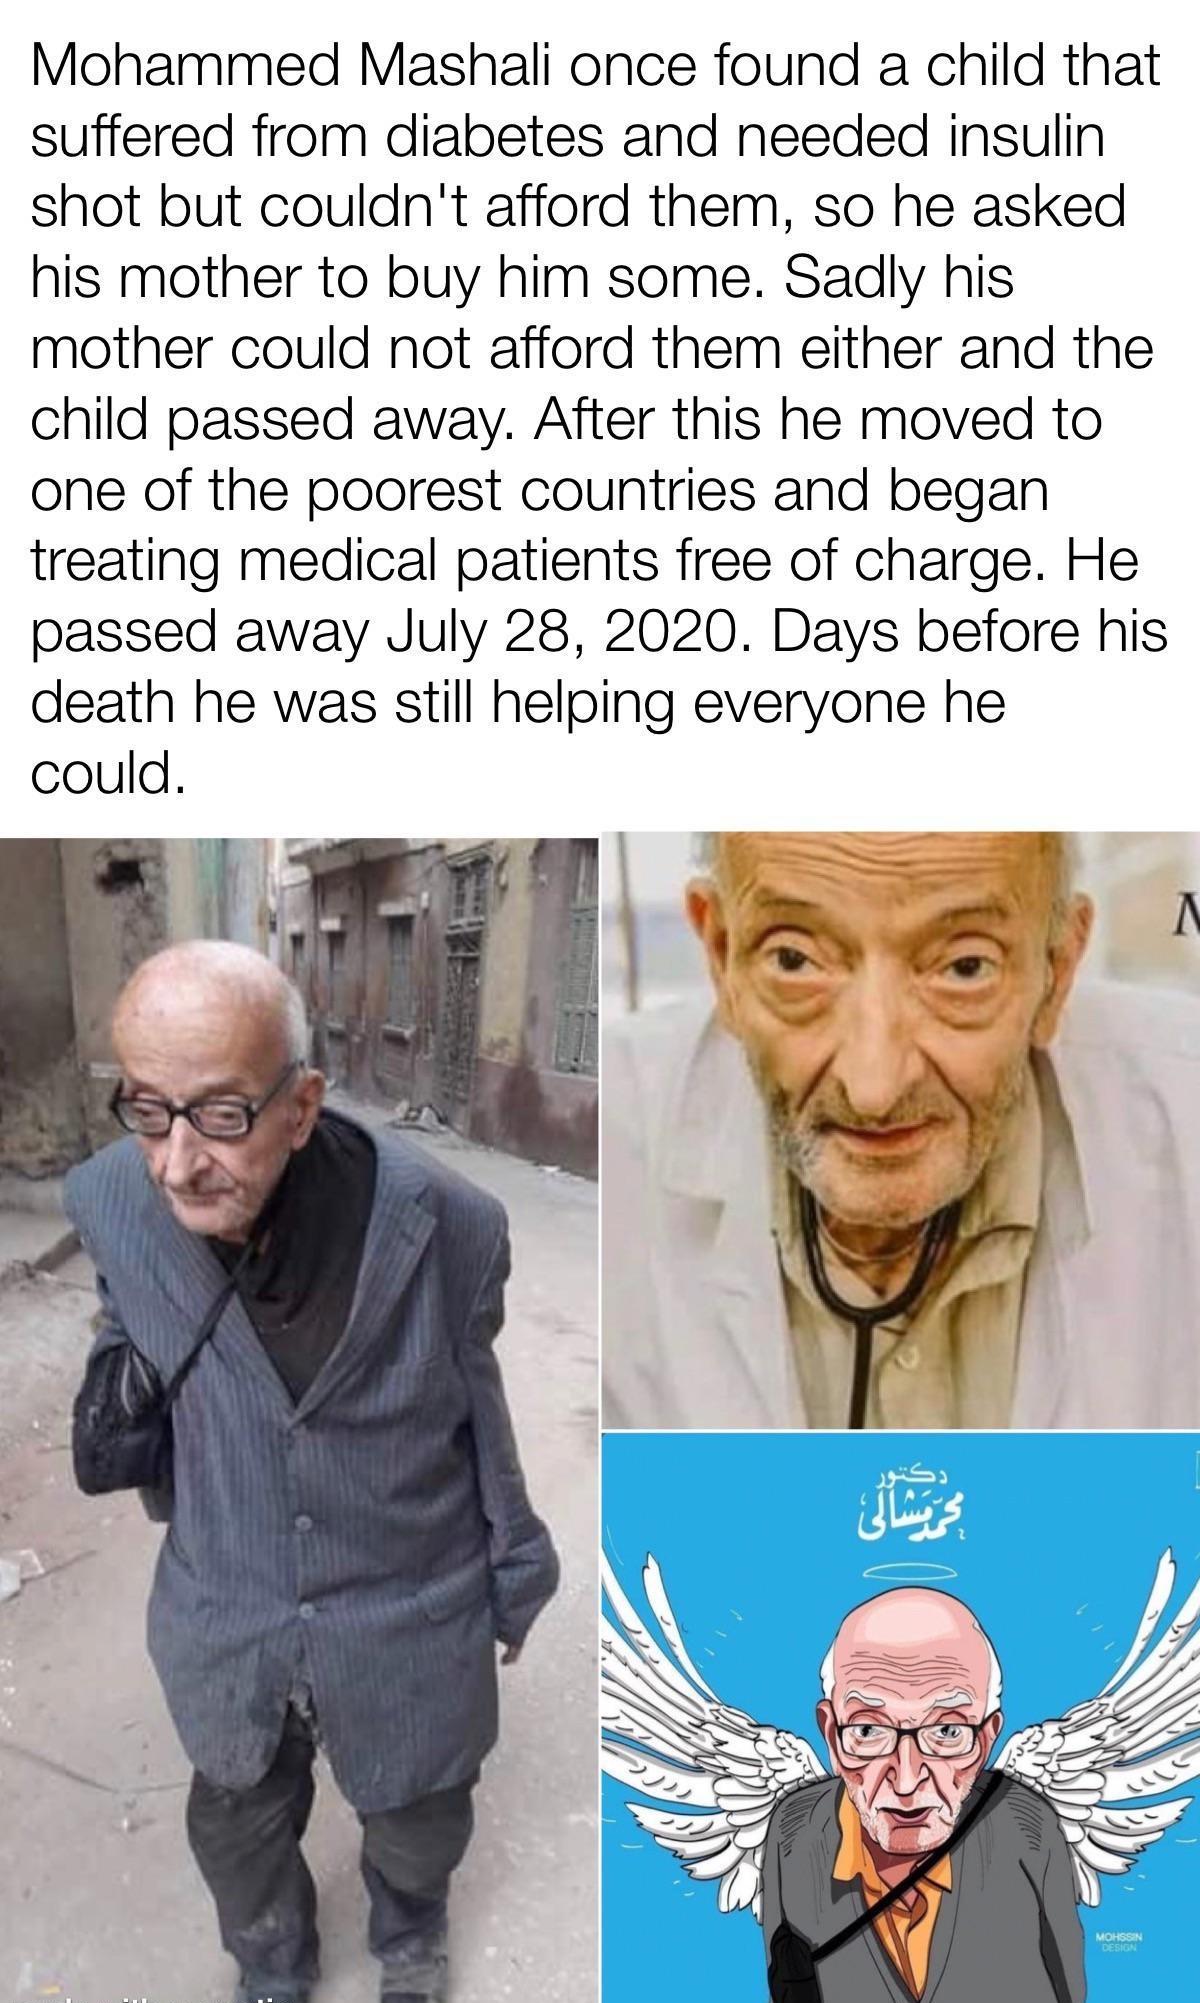 [image] A true Hero